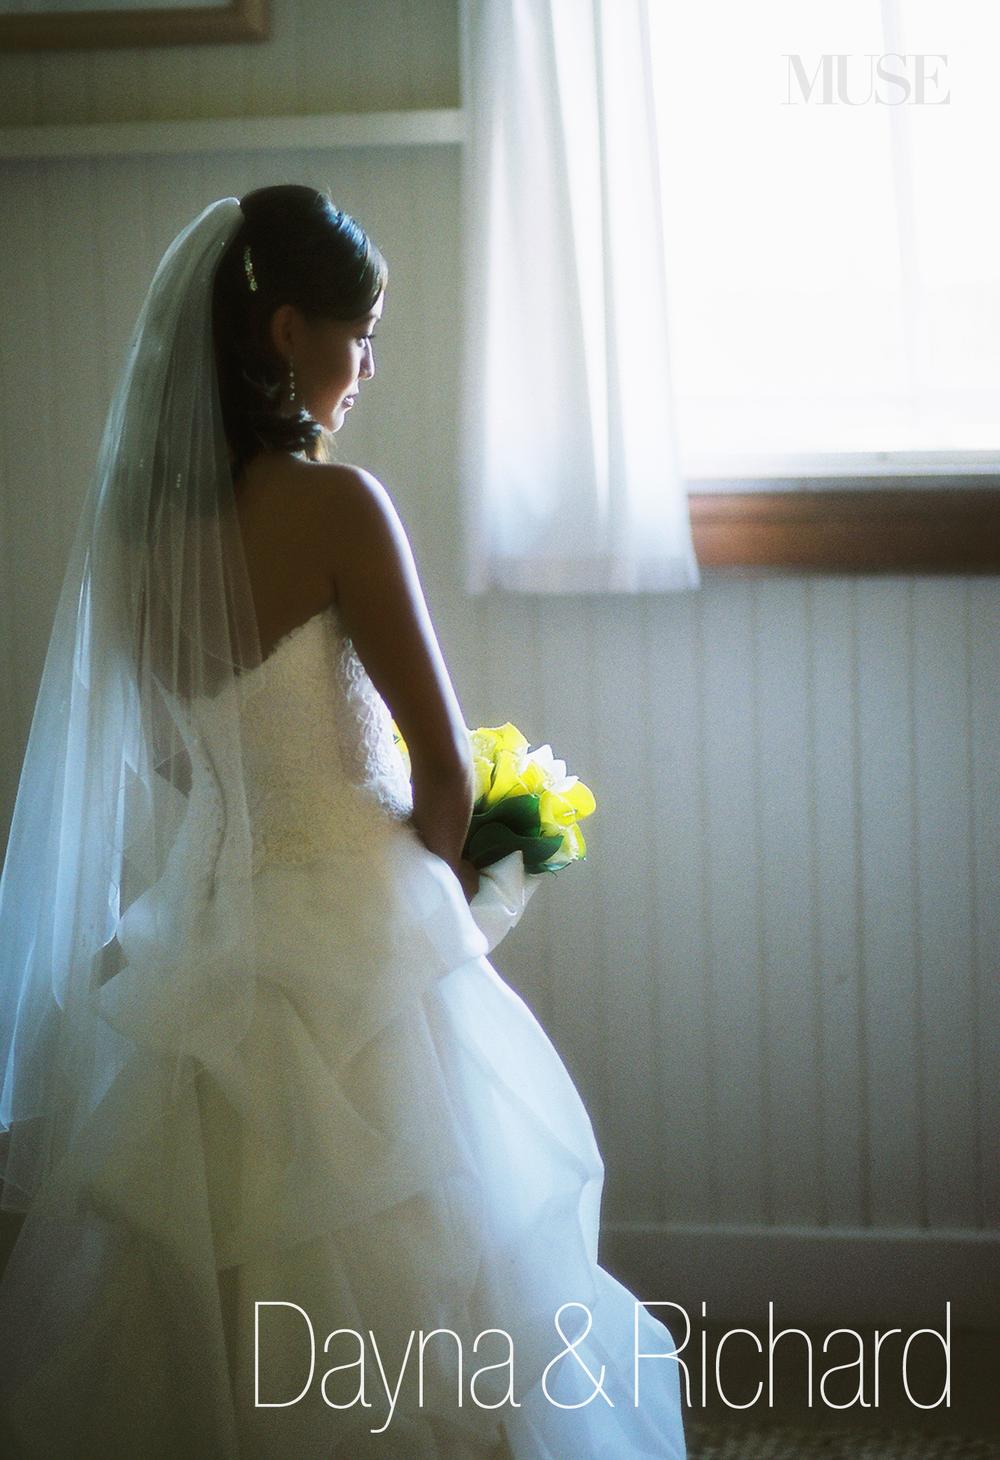 MUSE Bride Erick Rhodes Photography Waimea Kauai Wedding